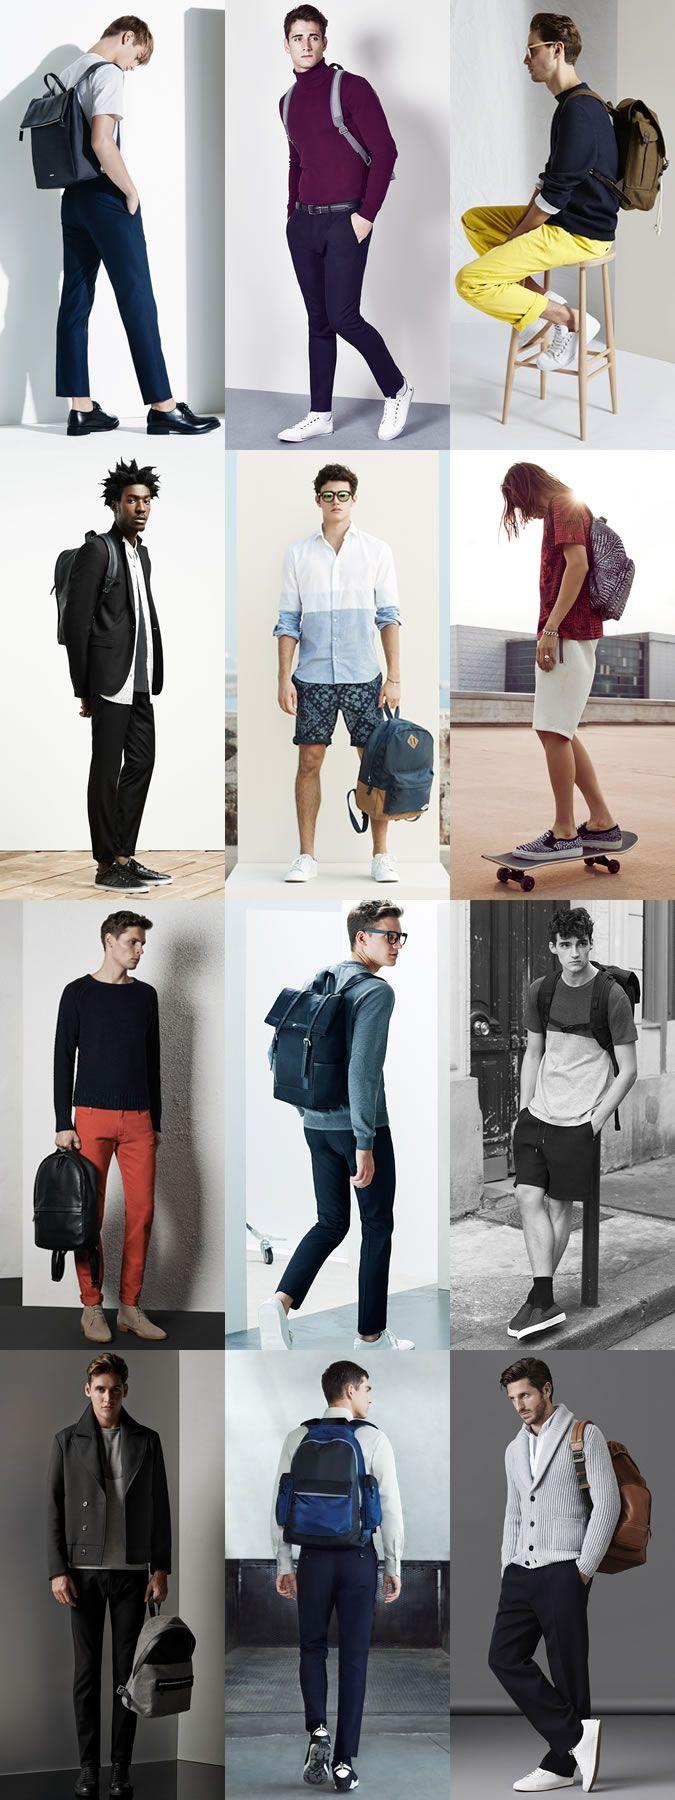 Men's Backpacks Outfit Inspiration Lookbook